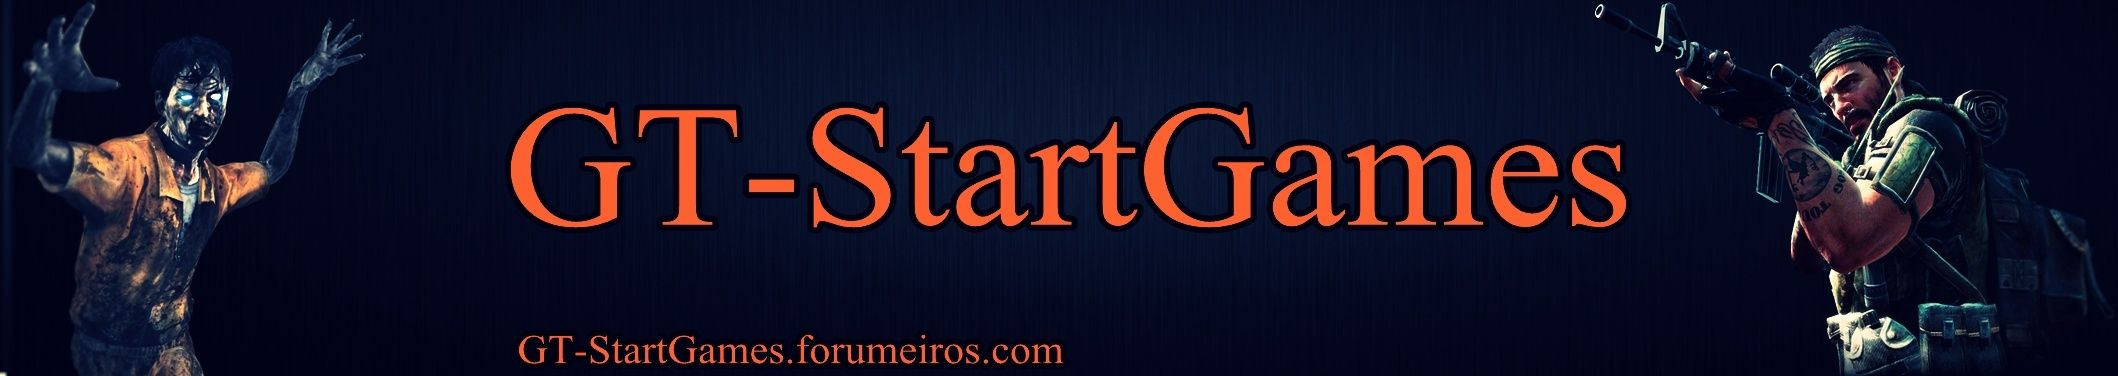 GT-StartGames